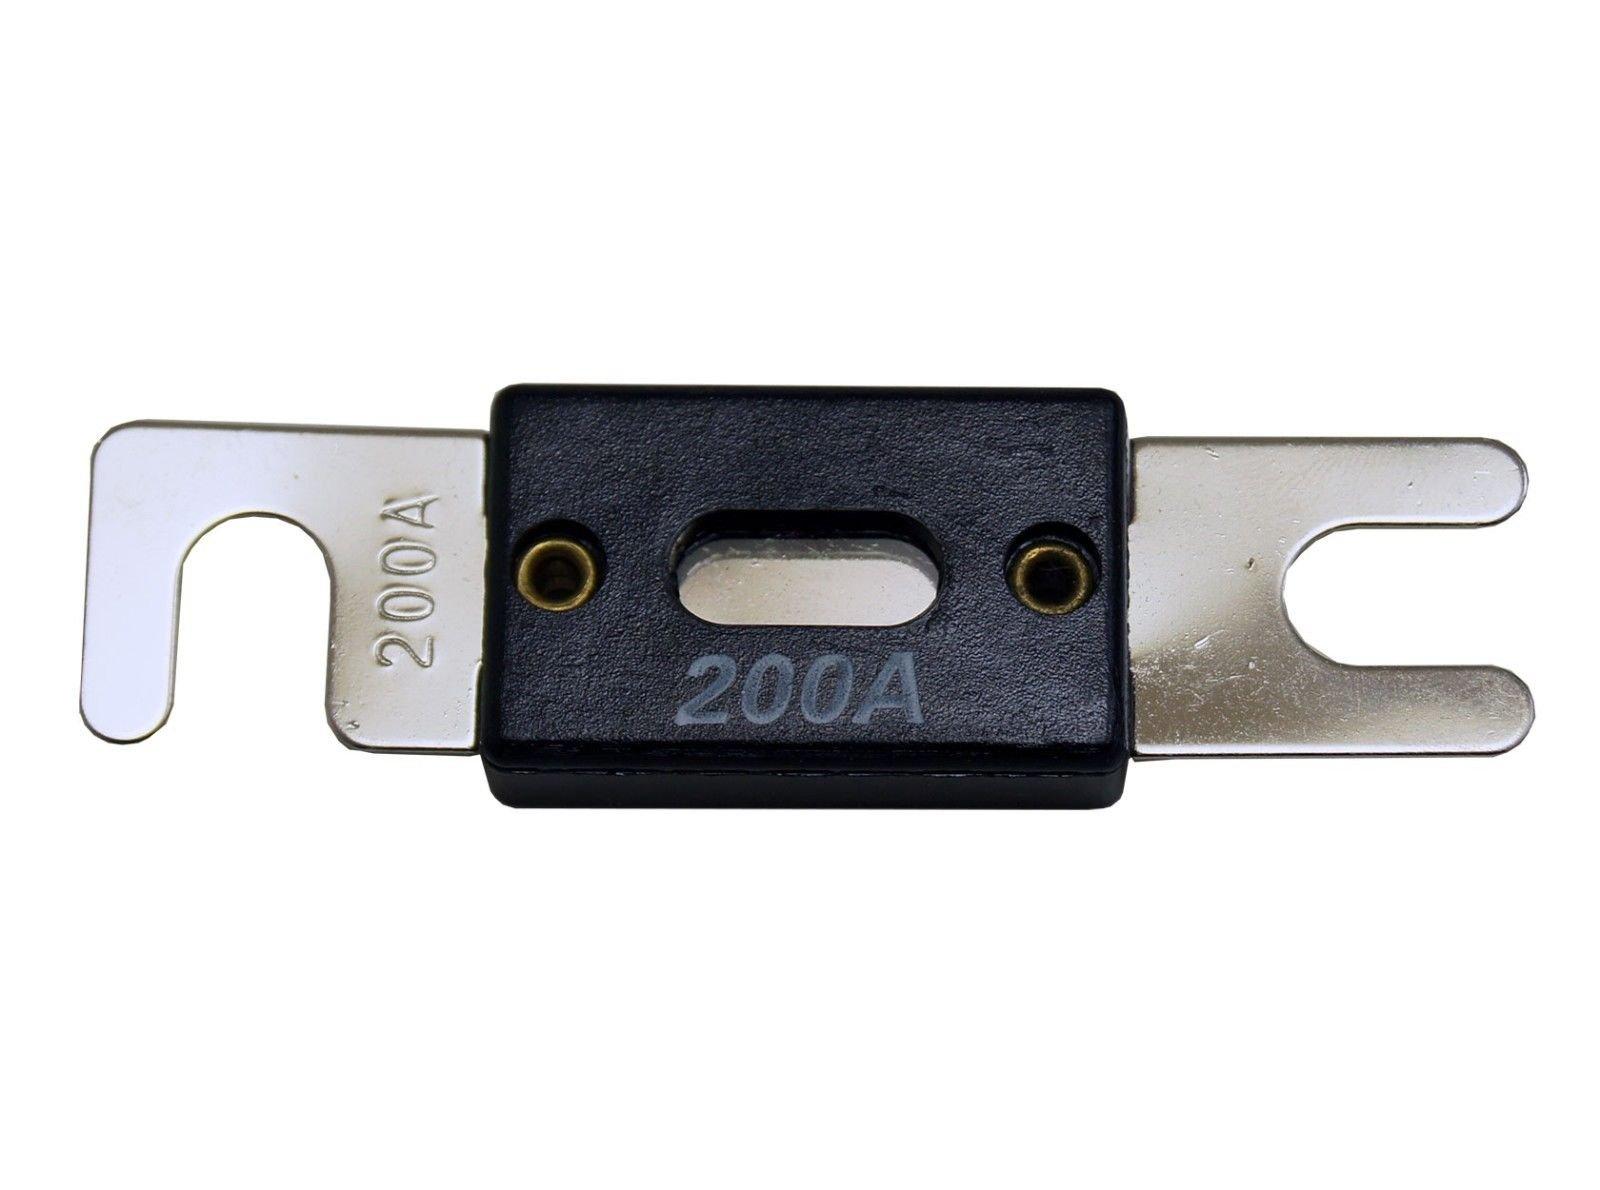 VOODOO 200 Amp ANL Fuse Brushed Nickel Holder 2/0 or 1/0 0 Gauge w/ 45 Deg Angled Cover by VOODOO (Image #7)